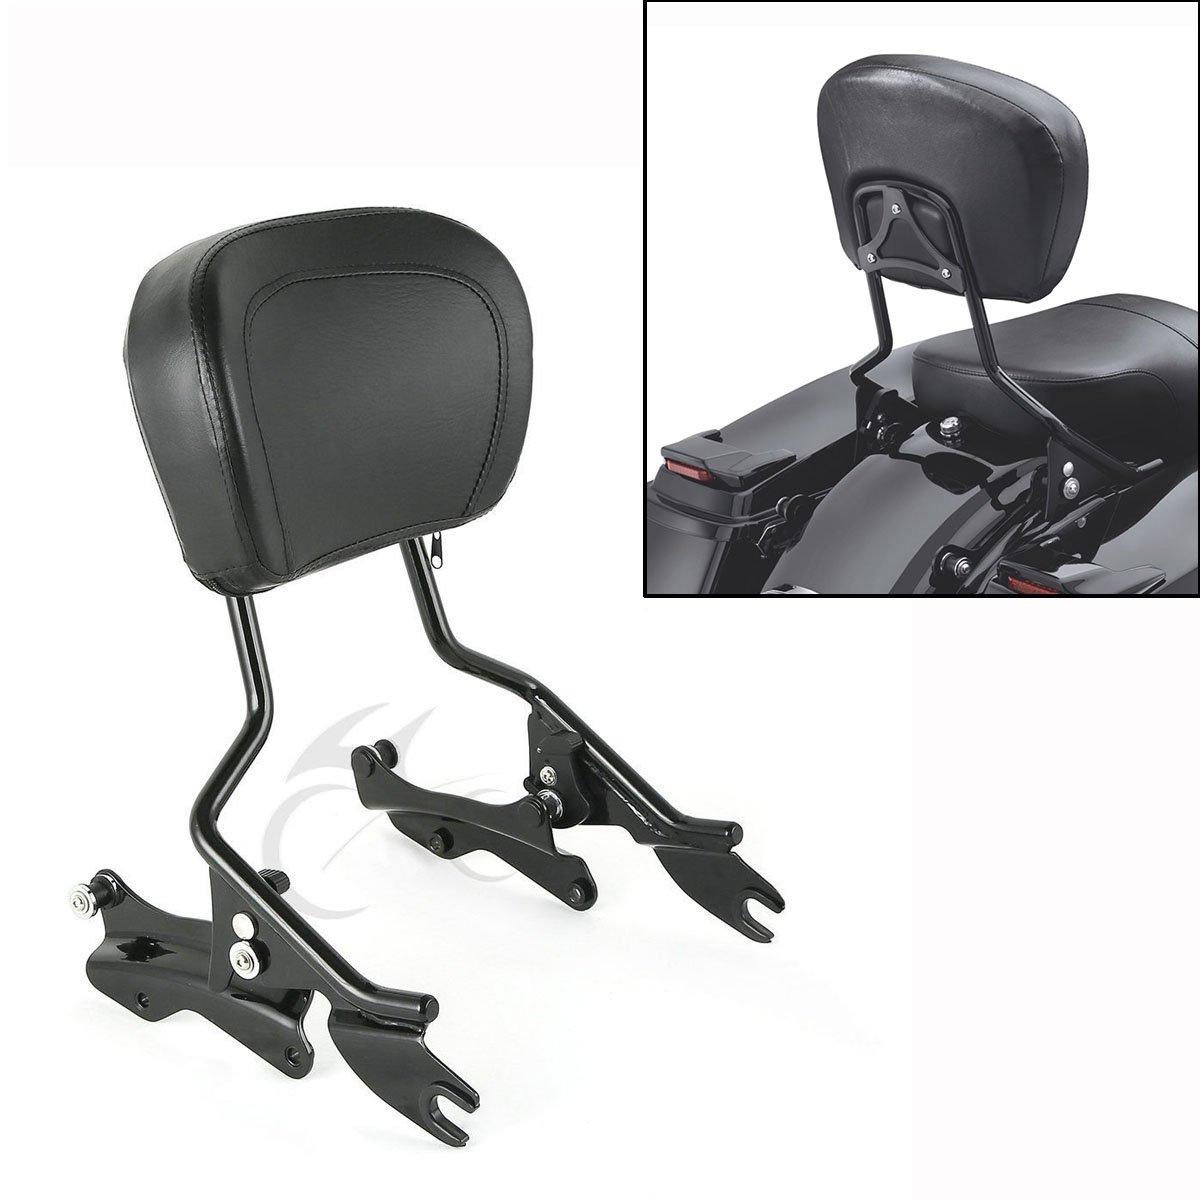 XFMT Backrest Sissy Bar + 4 Point Docking Kit w/Pad For Harley Street Glide 09-13 12